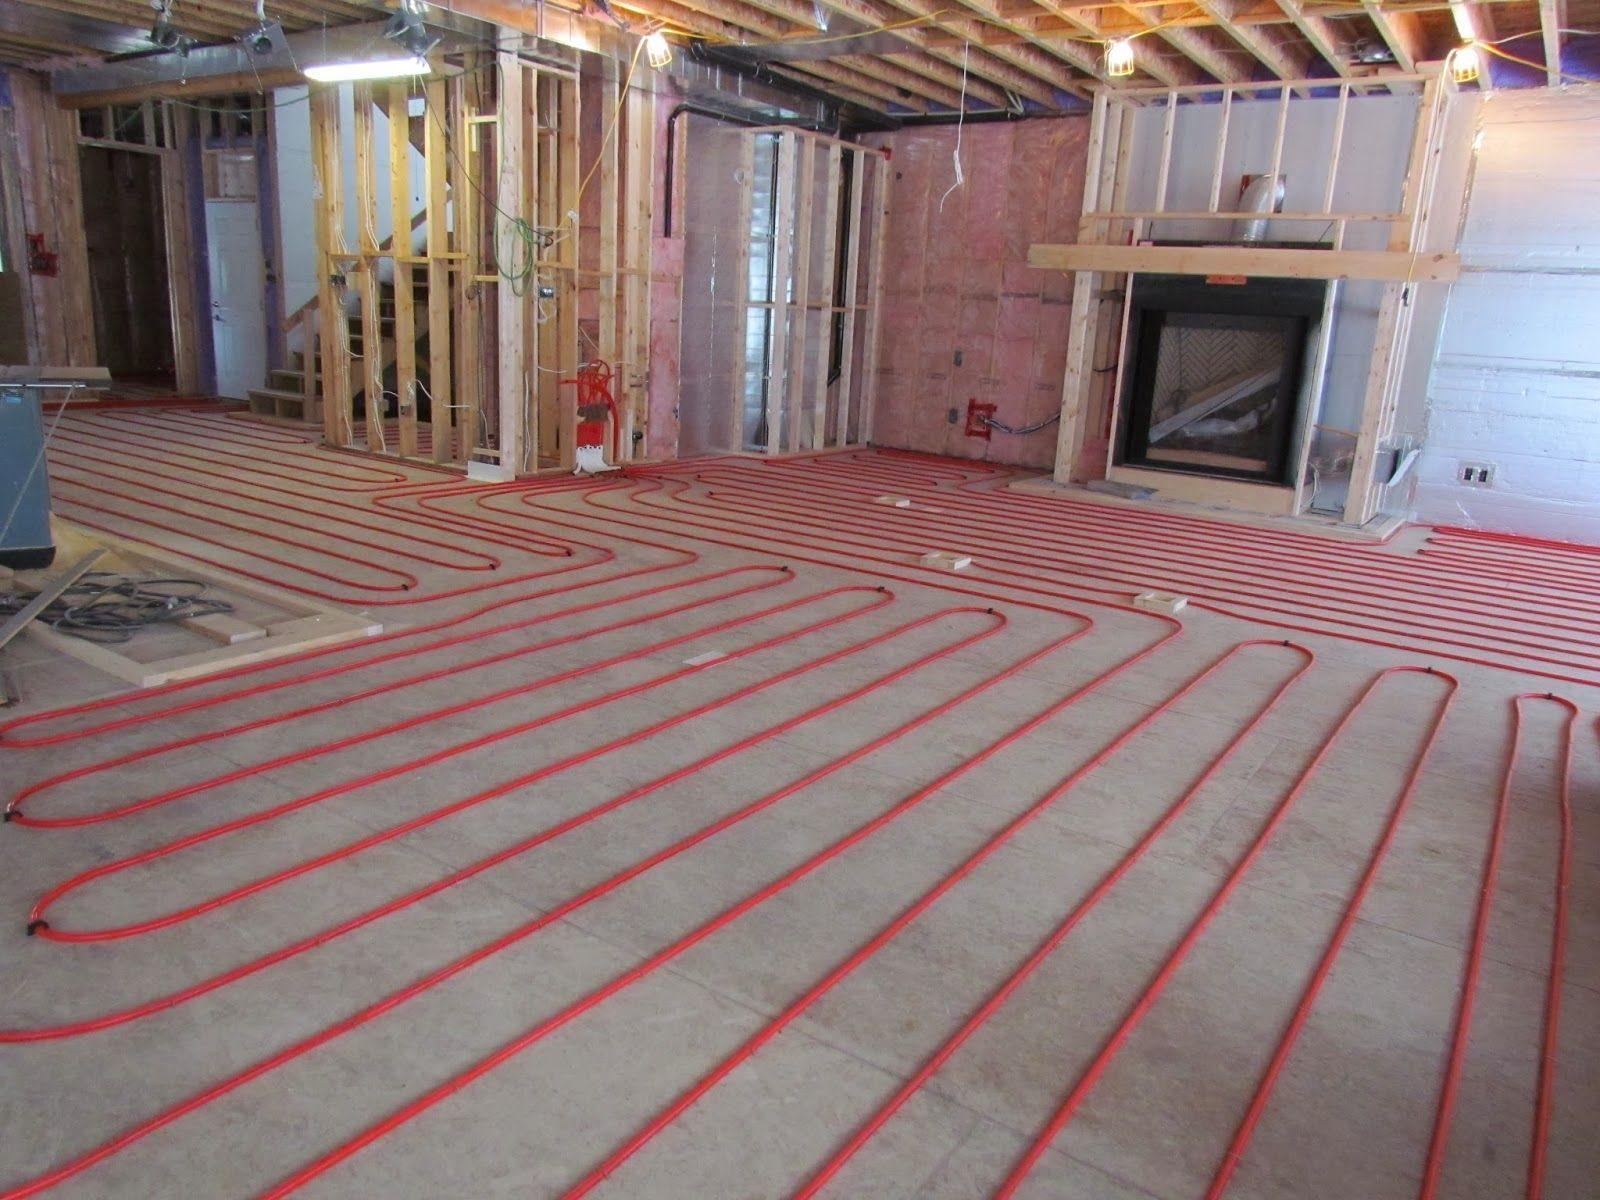 Basement Floor Heating Under Carpet Radiant Floor Heating Heated Tile Floor Floor Heating Systems